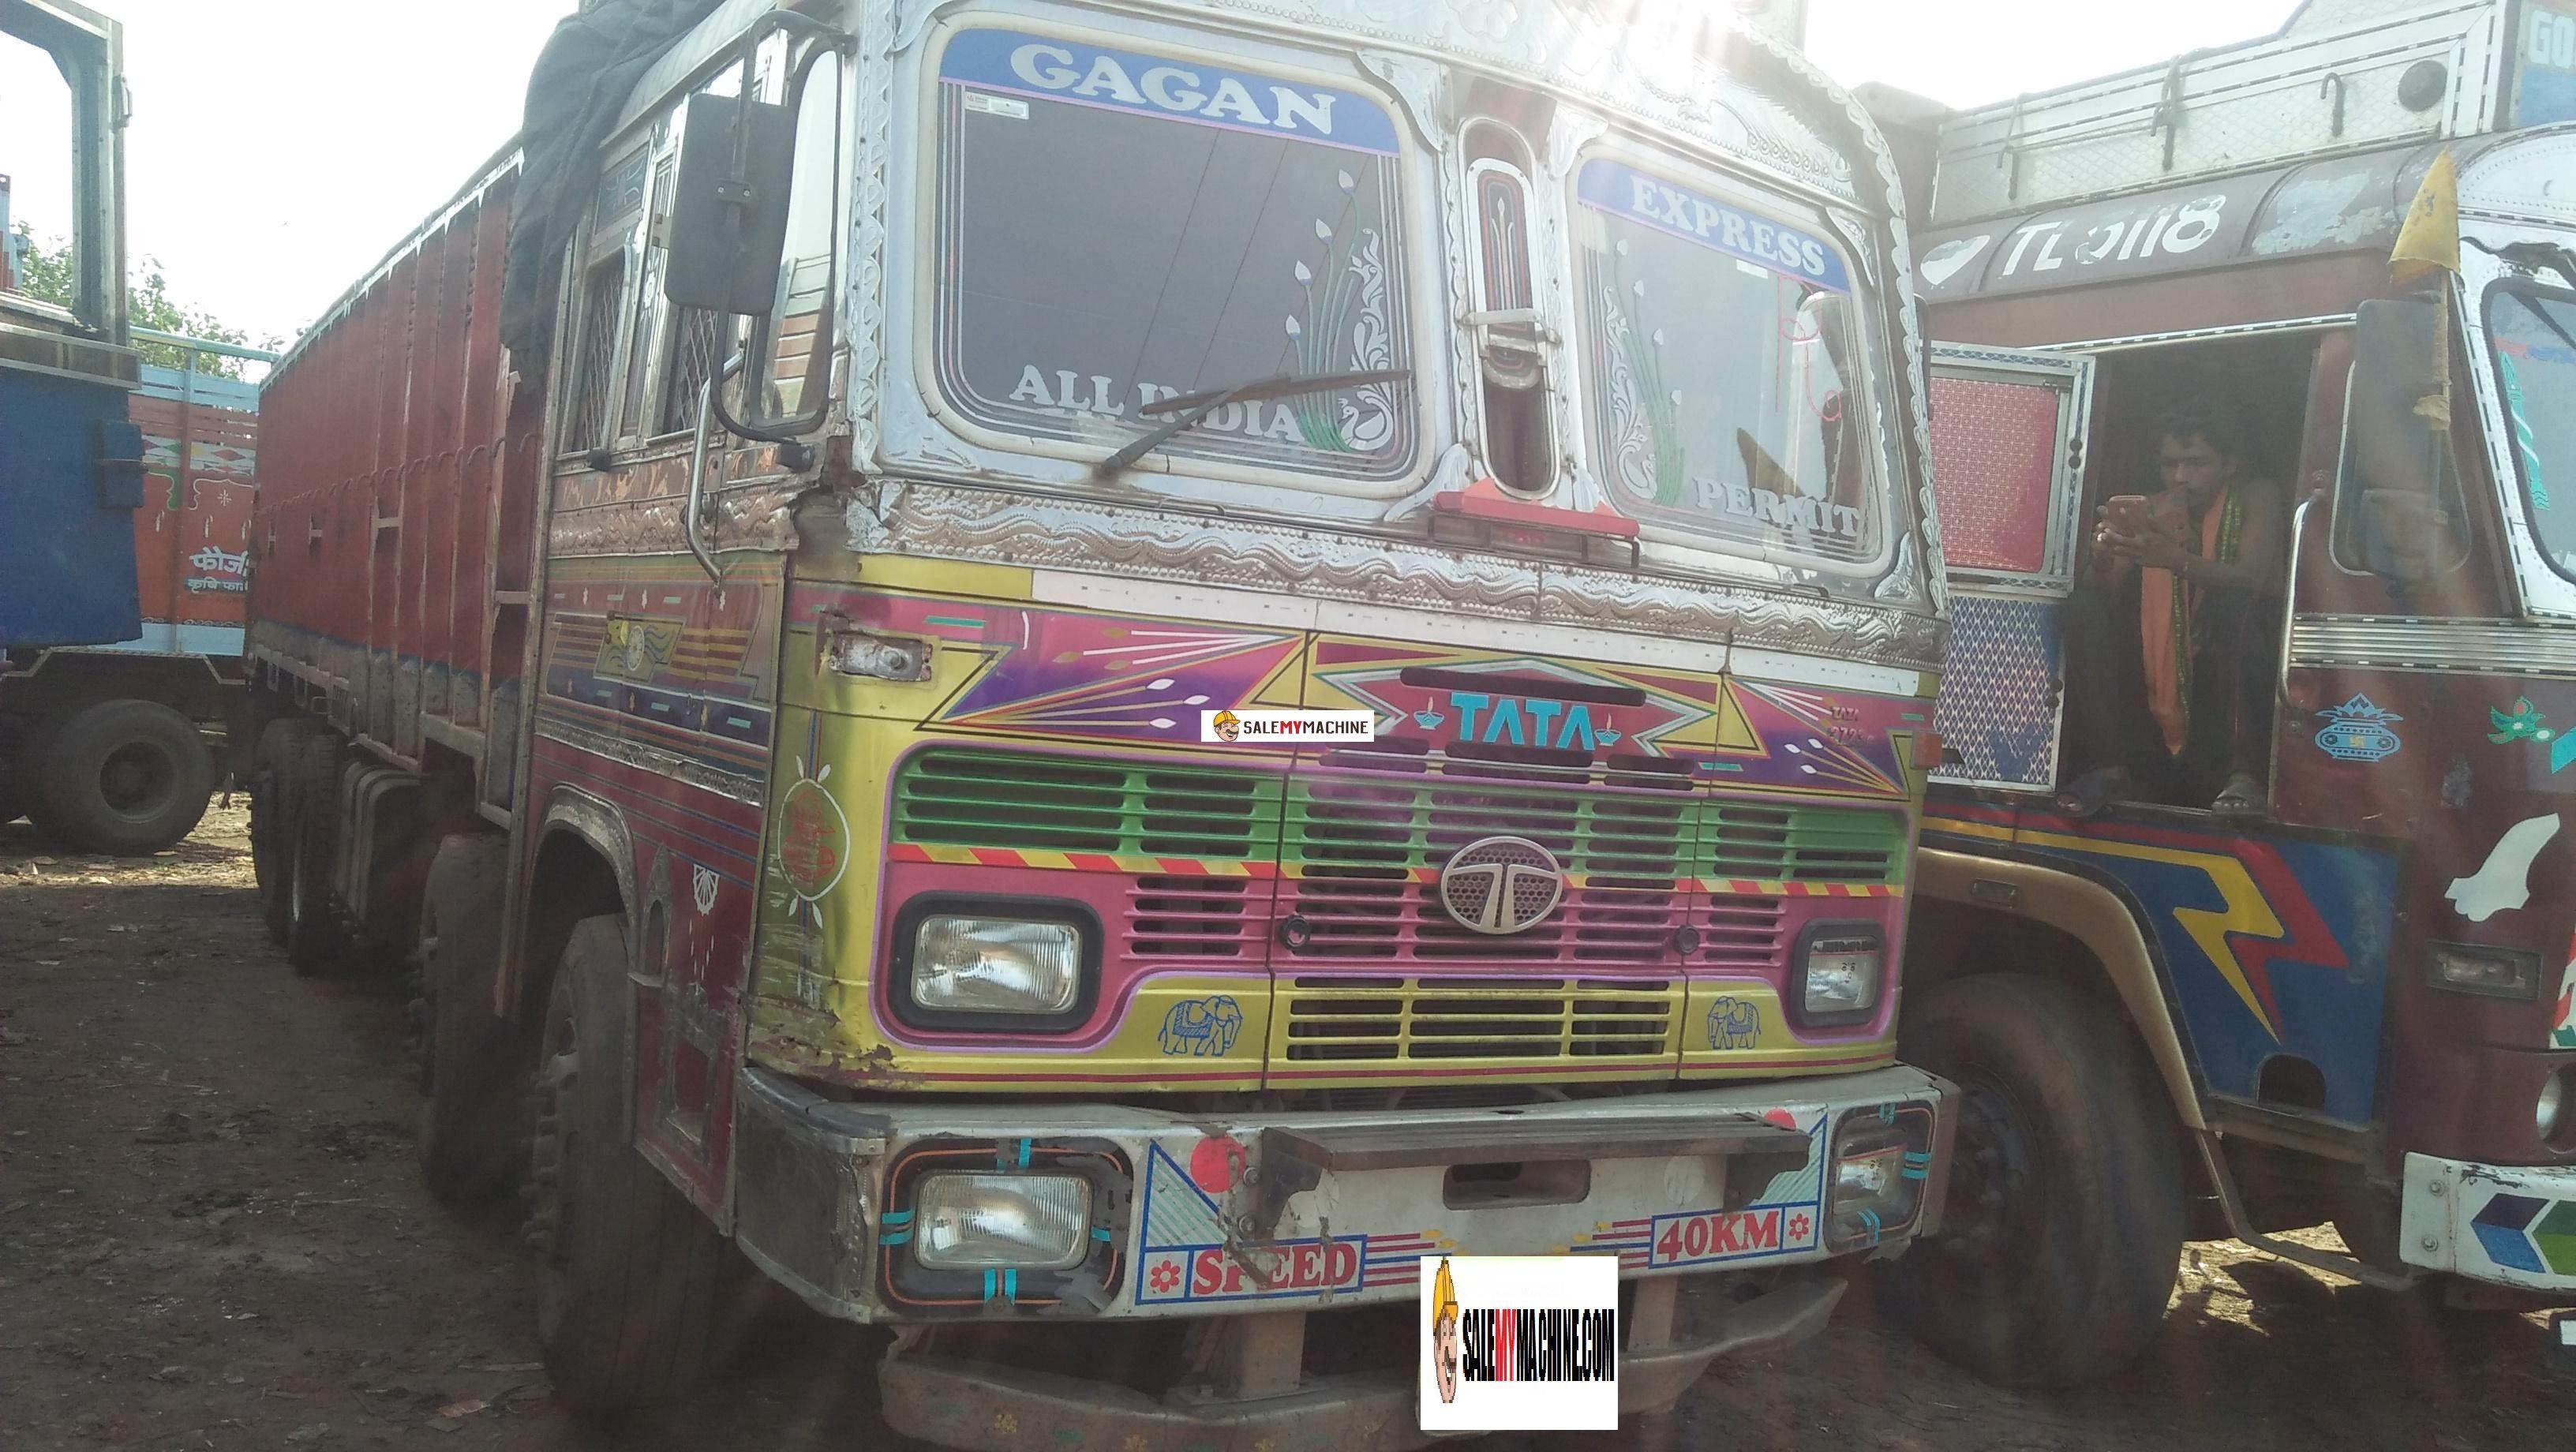 used TATA 14 WHEELER TRUCK for sale in odisha,india at